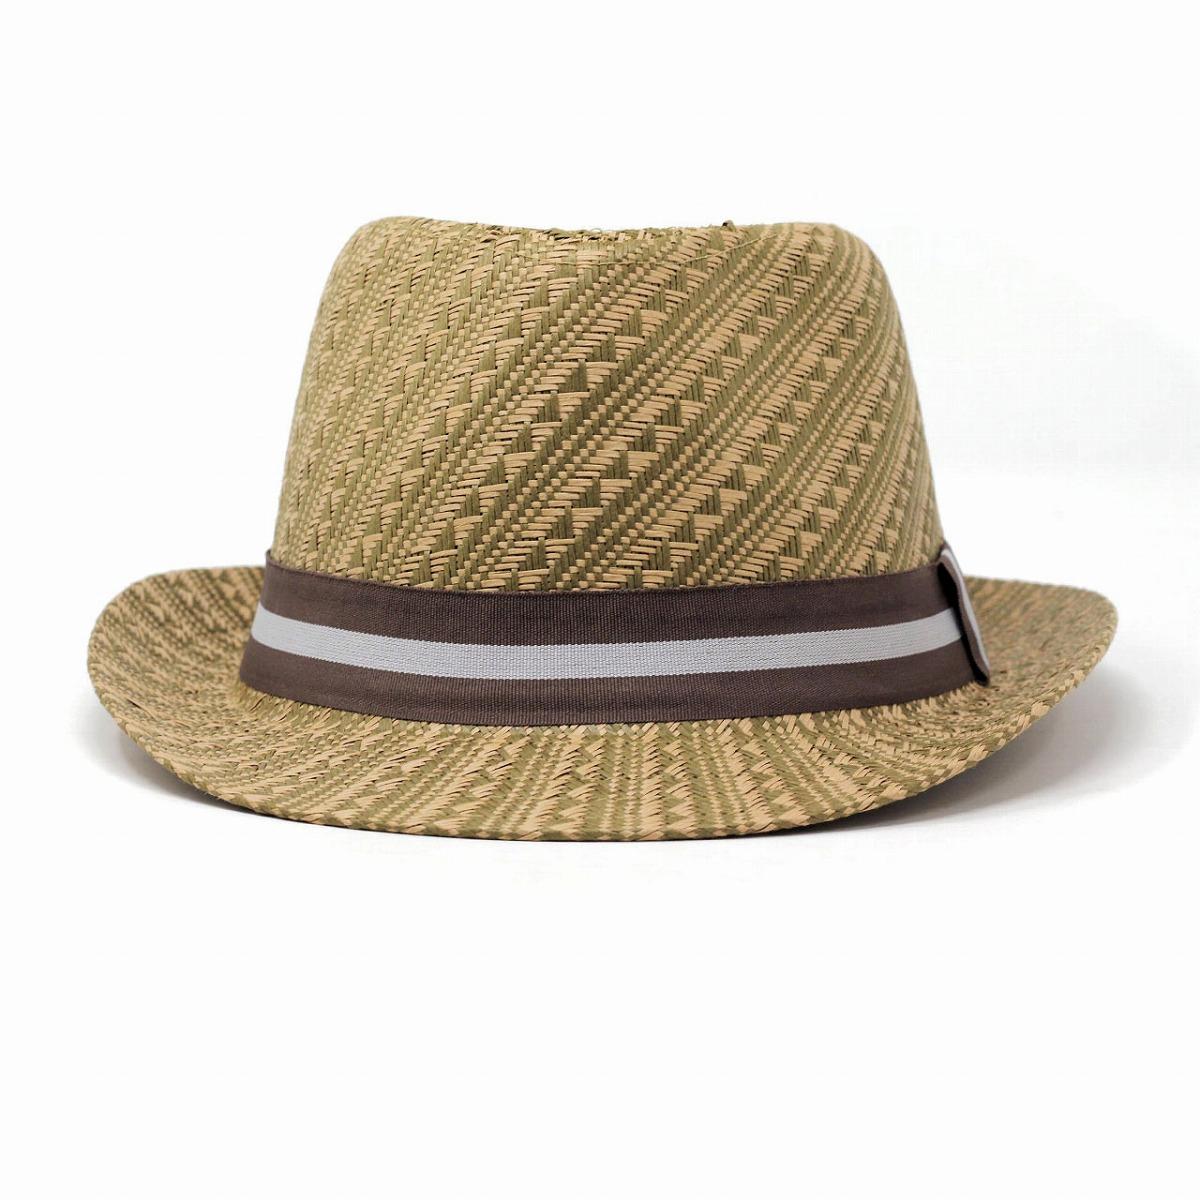 Size import hat whole pattern casual beige [cowboy hat] that HENSCHEL straw  hat men lady's paper HENSCHEL soft felt hat herringbone brand soft felt